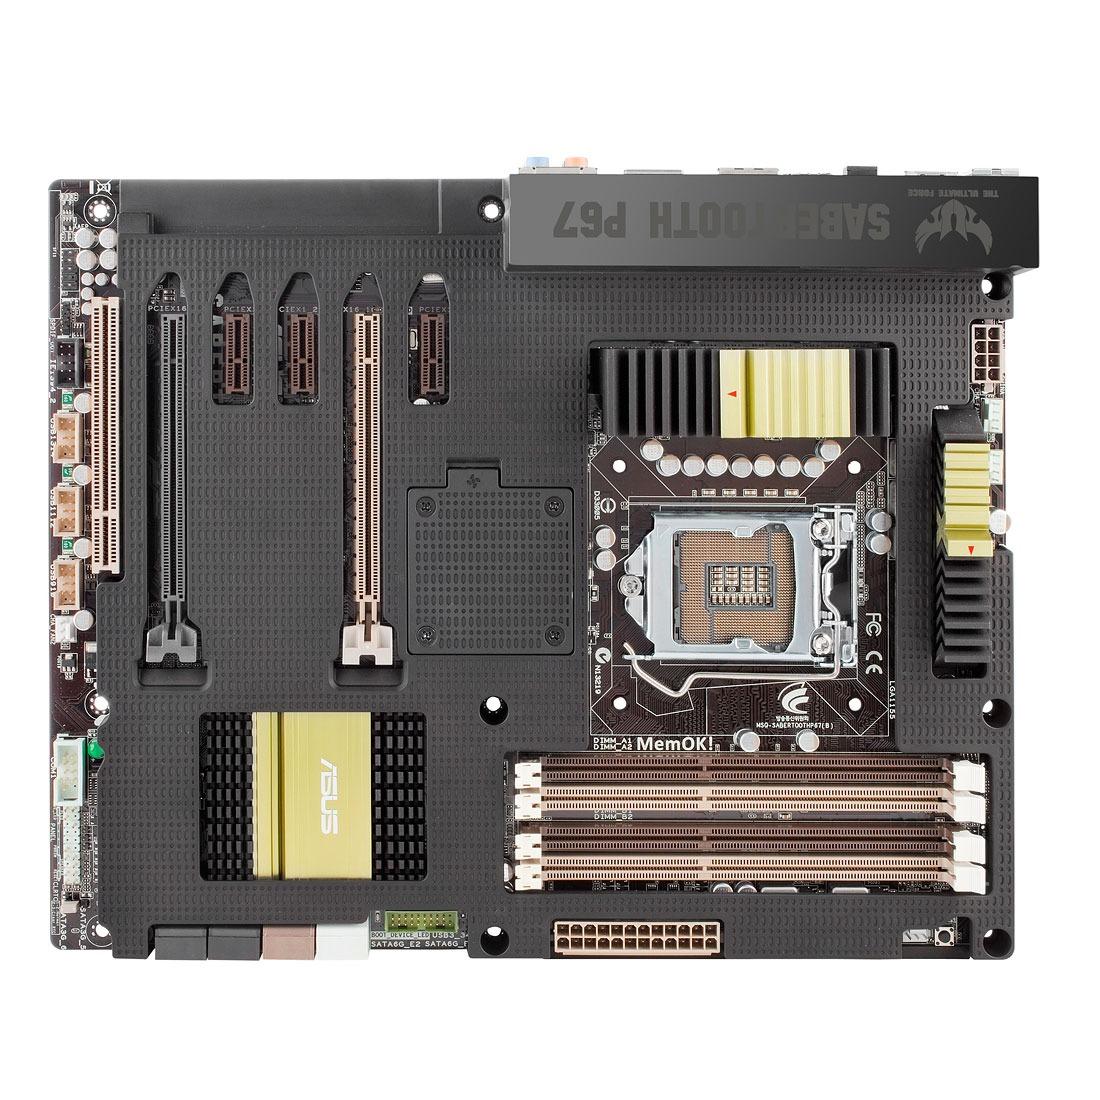 Carte mère ASUS SABERTOOTH P67 REV 3.0 Carte mère ATX Socket 1155 Intel P67 Express Revision B3 (garantie 3 ans)